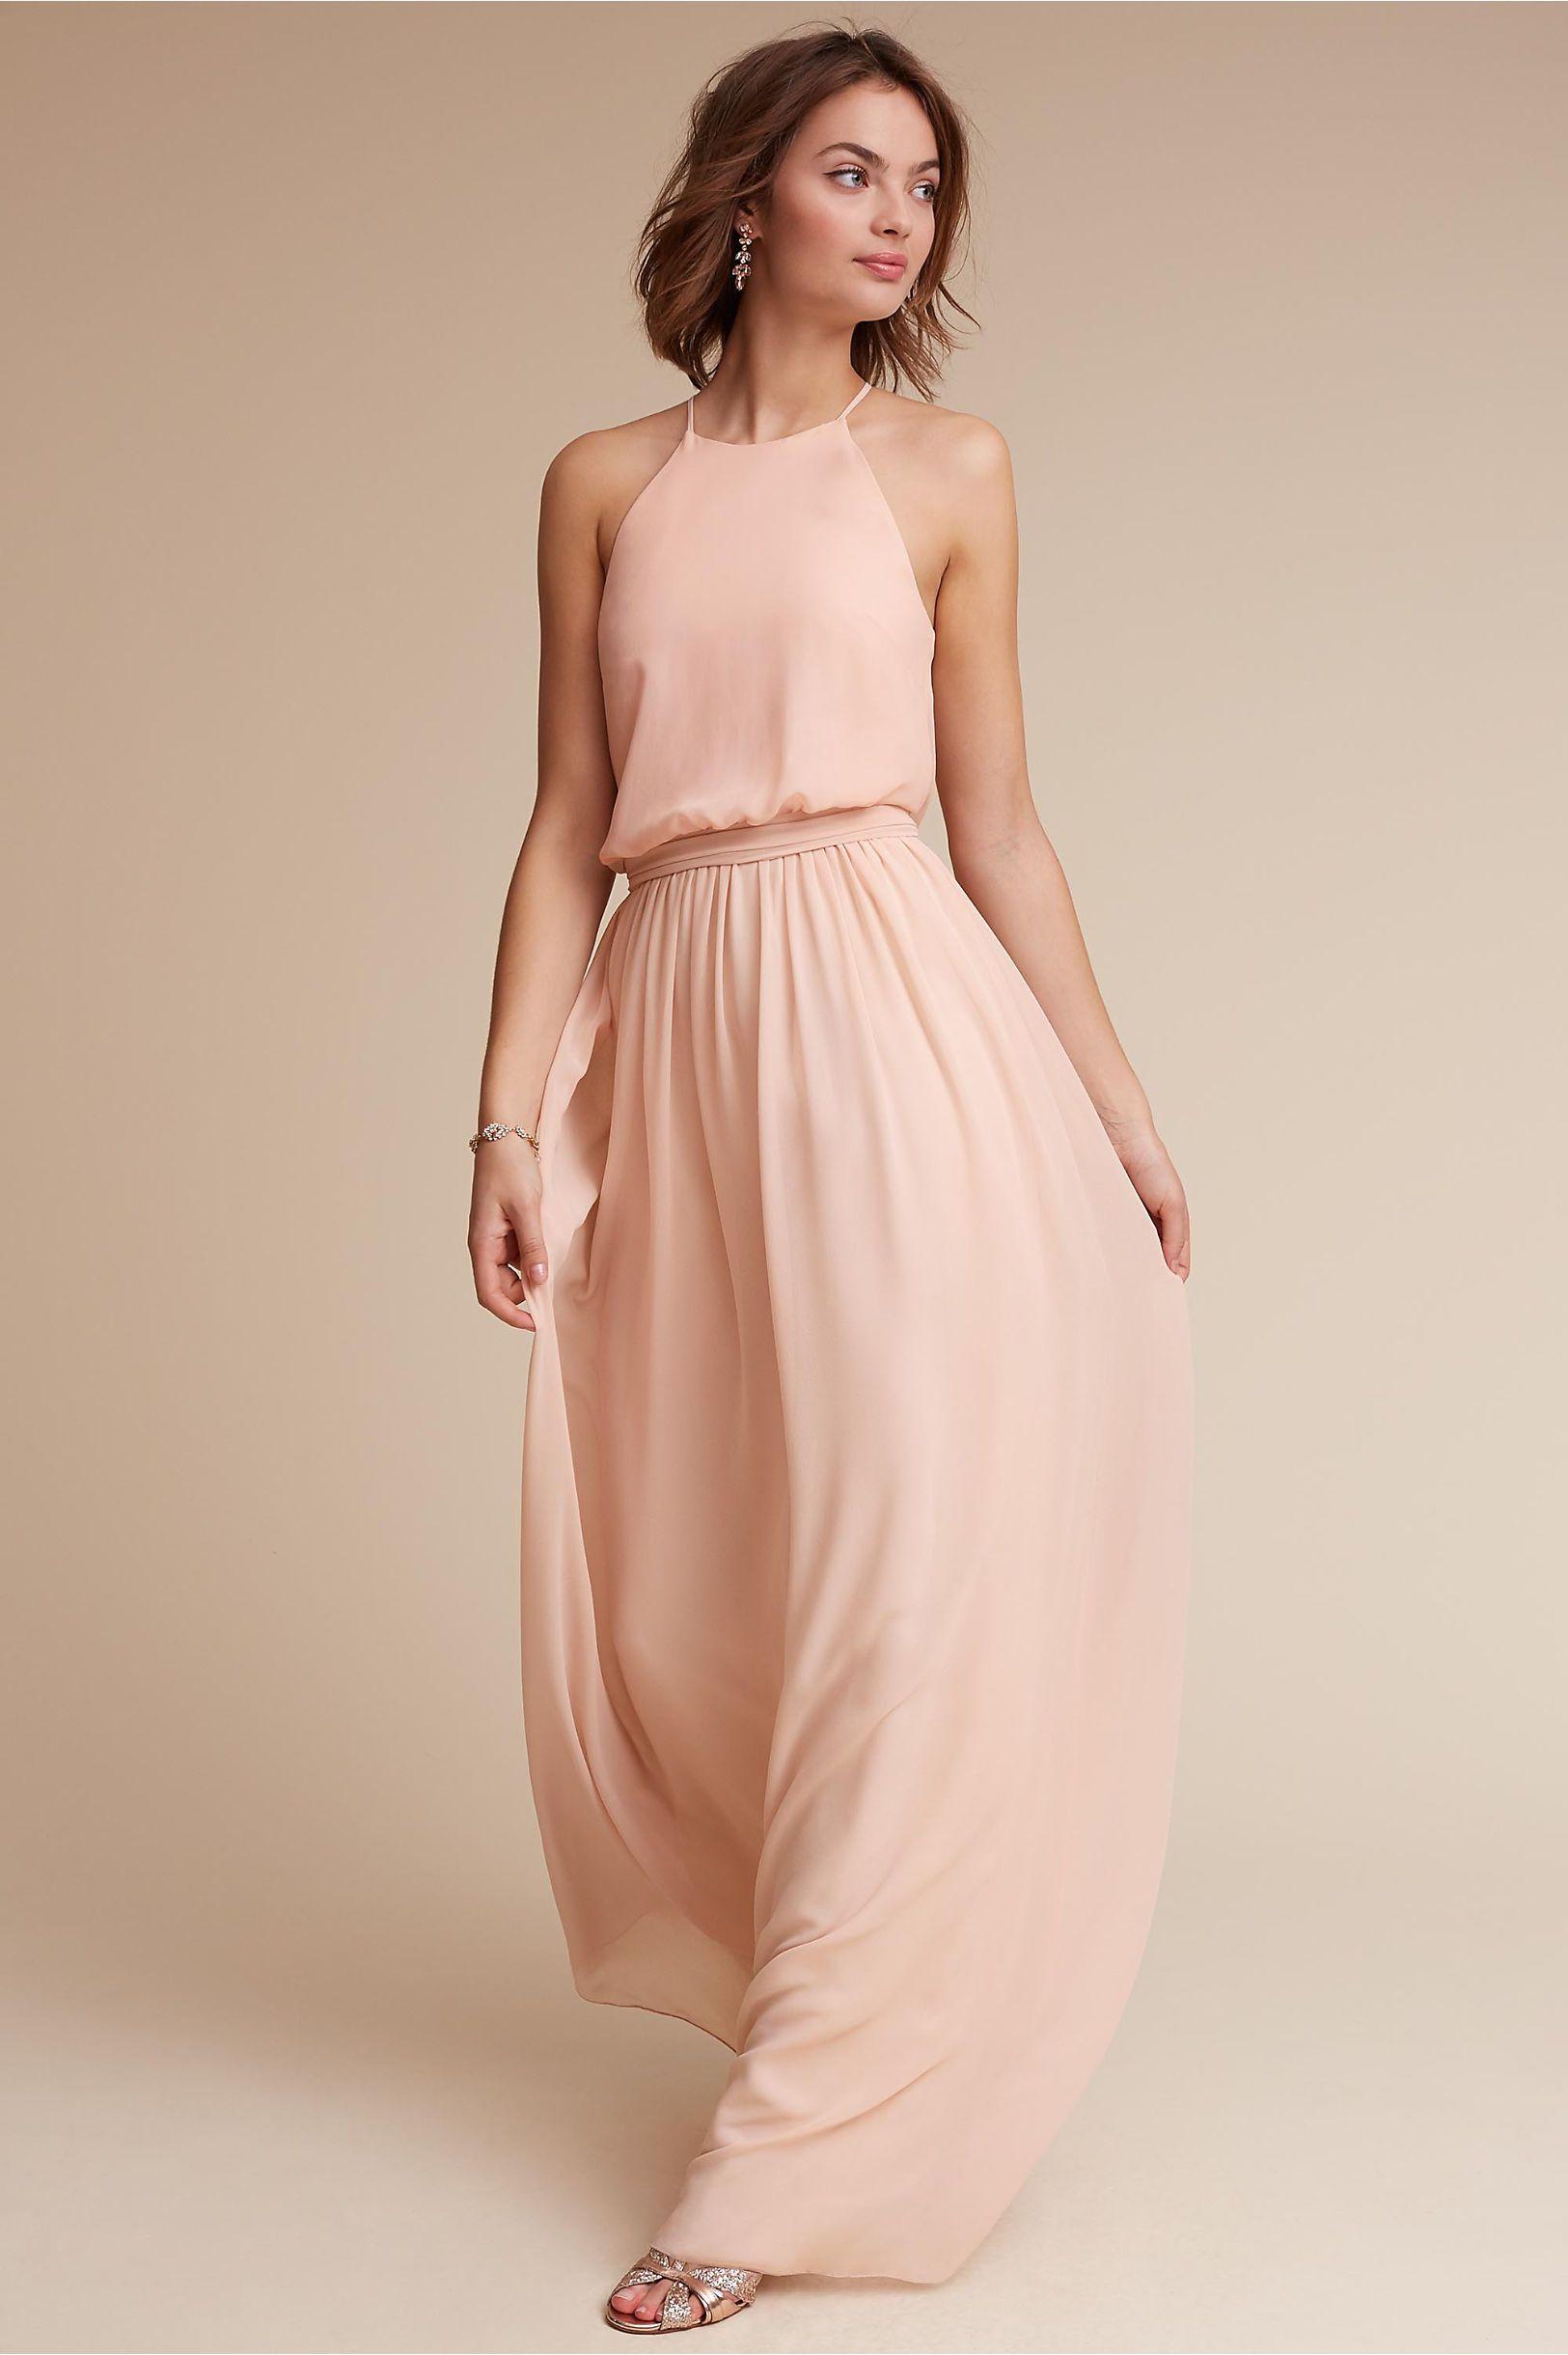 bda48c3b57d Bhldn Alana Dress In Bridesmaids View All Dresses Bhldn Wedding